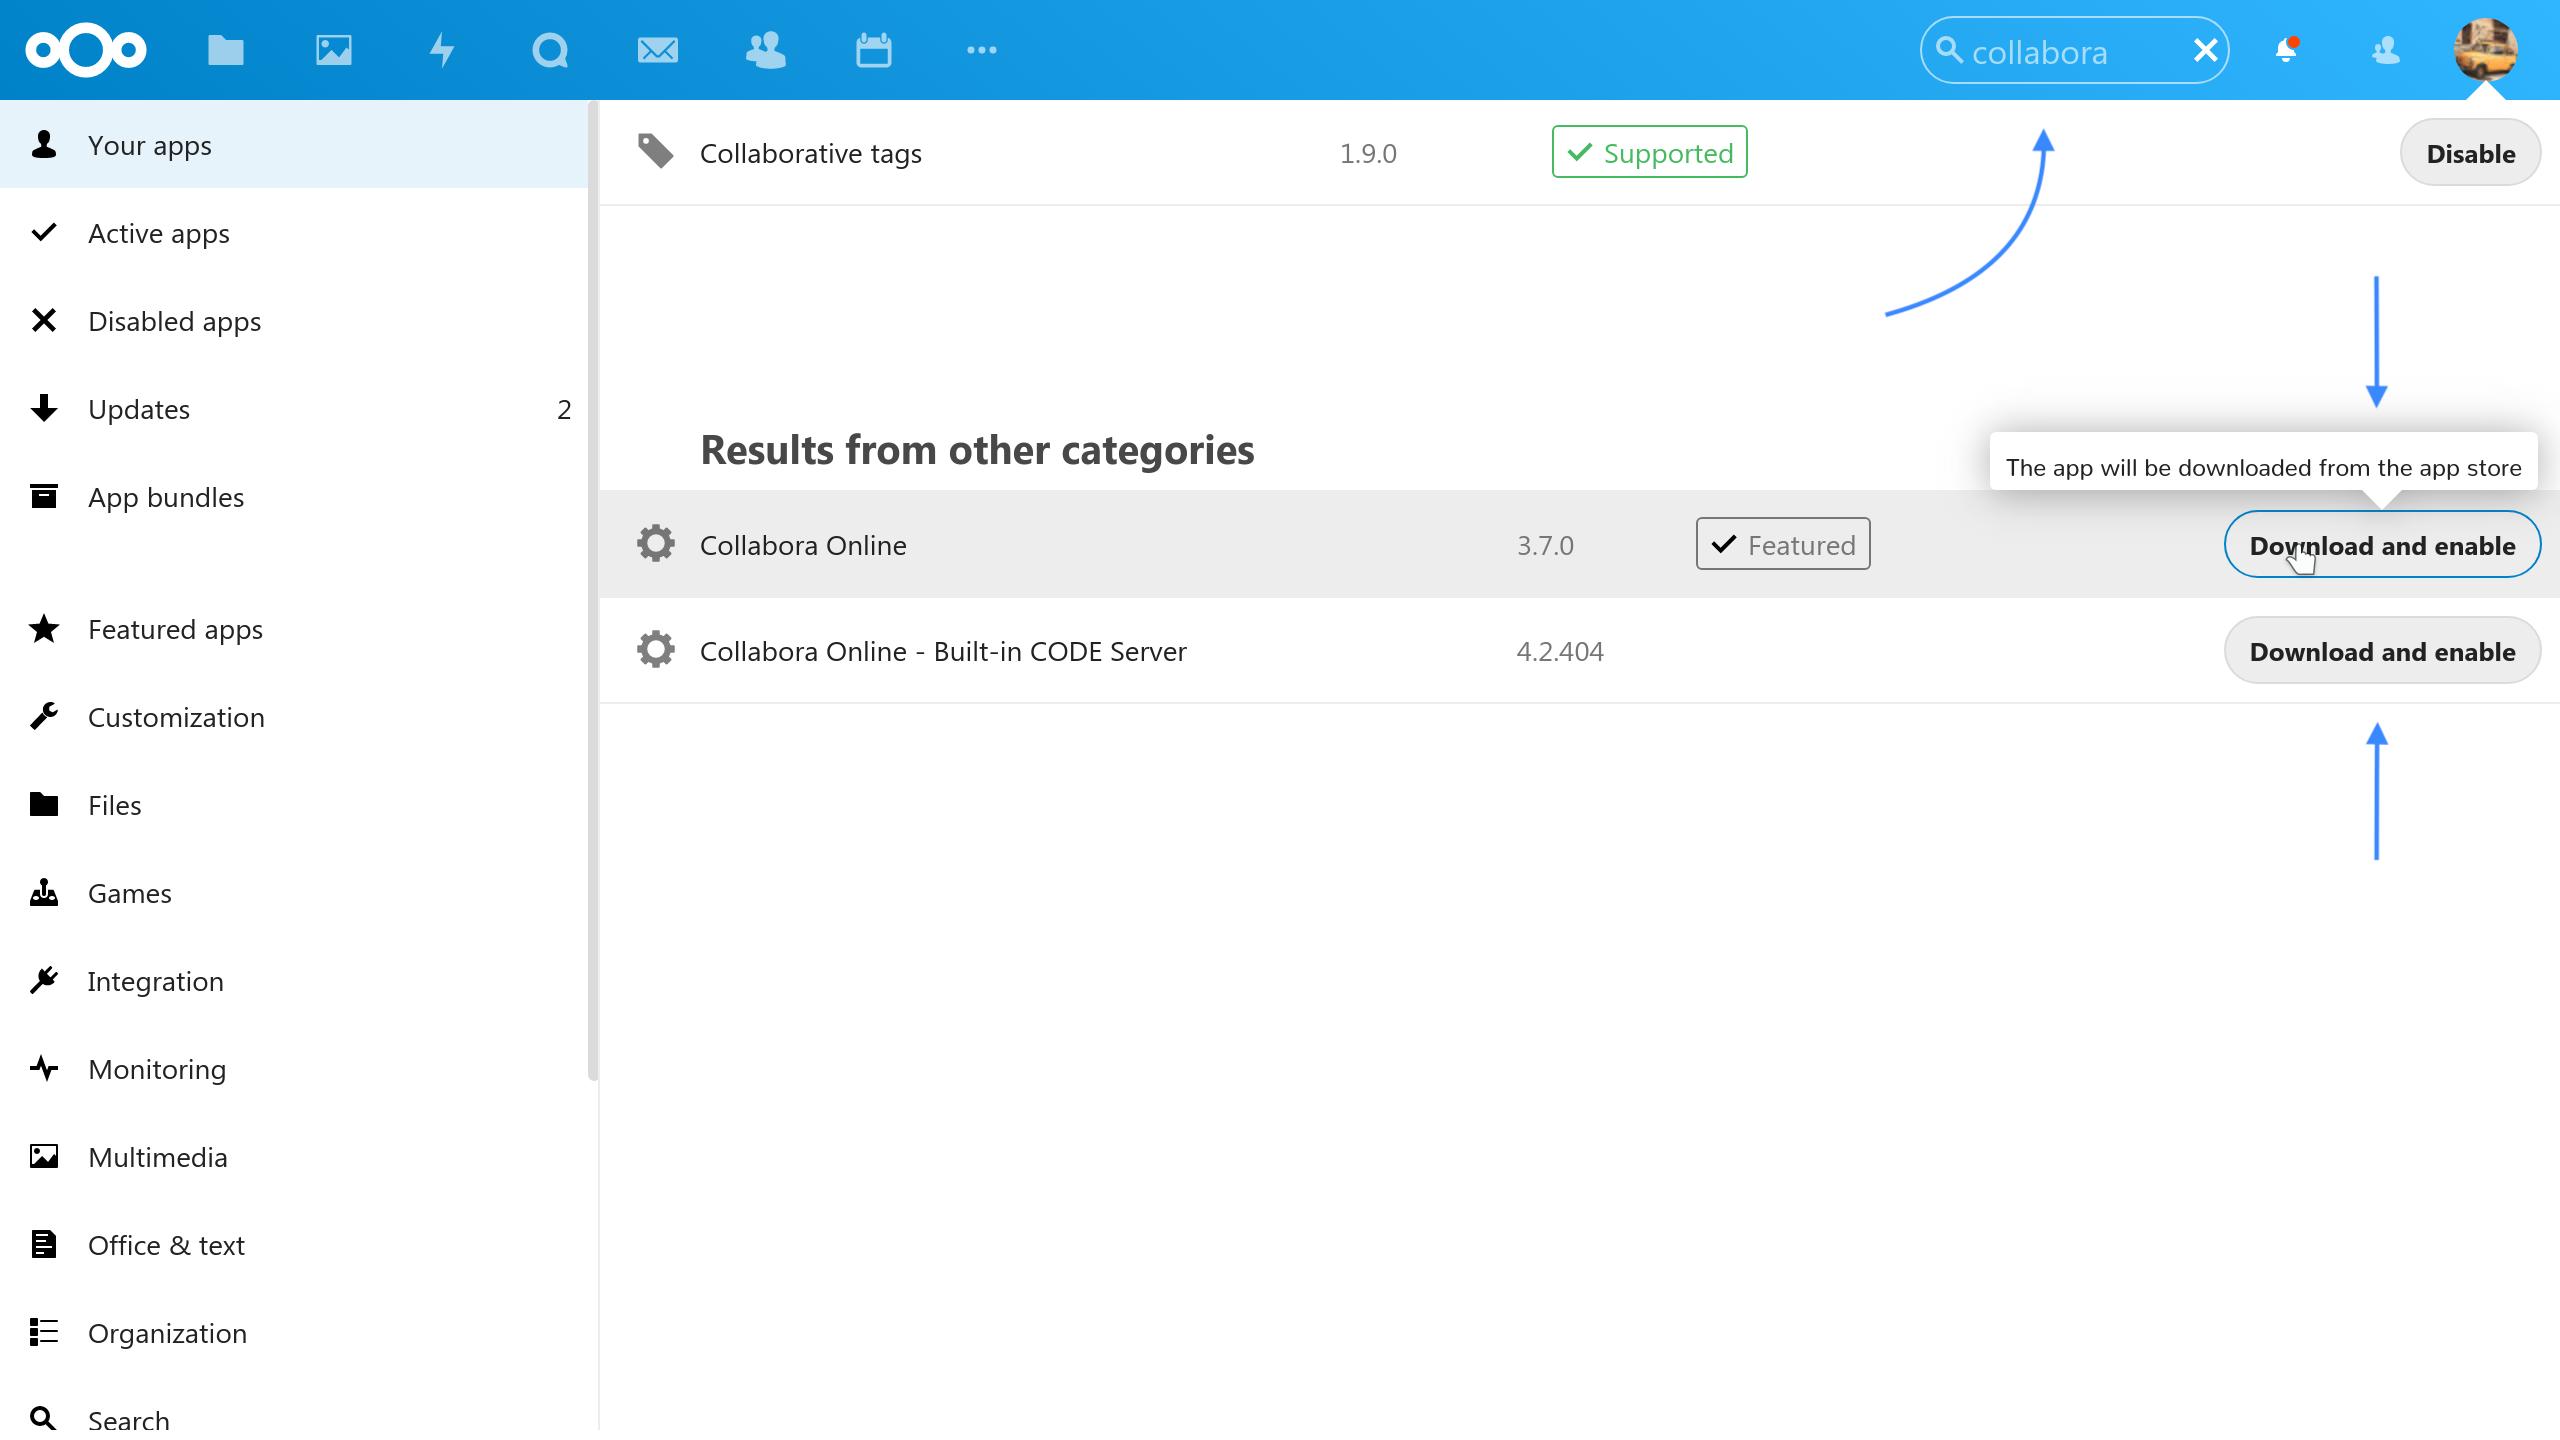 Built-in Code server Collabora screenshot